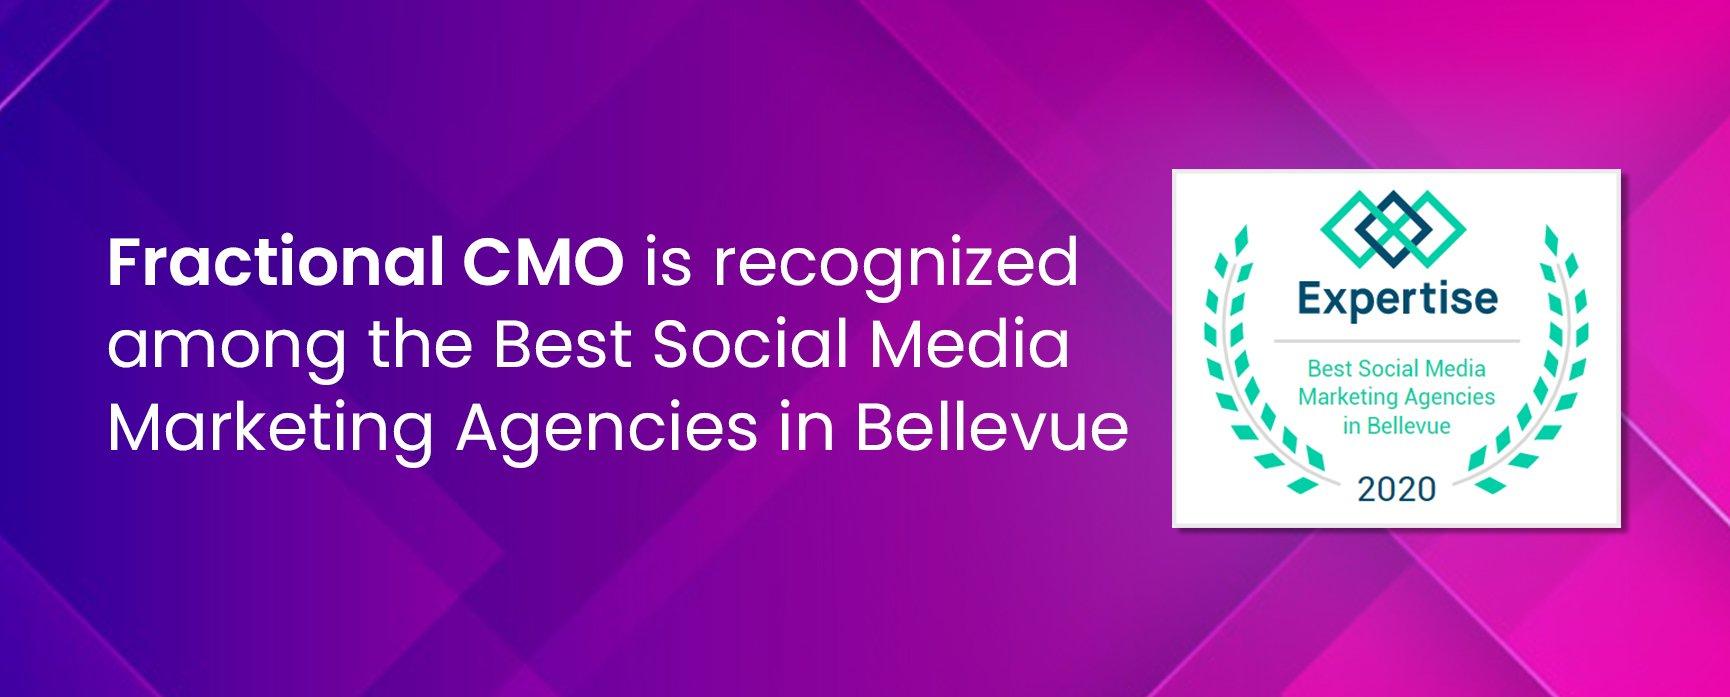 Best Social Media Marketing Agency in Belleuve